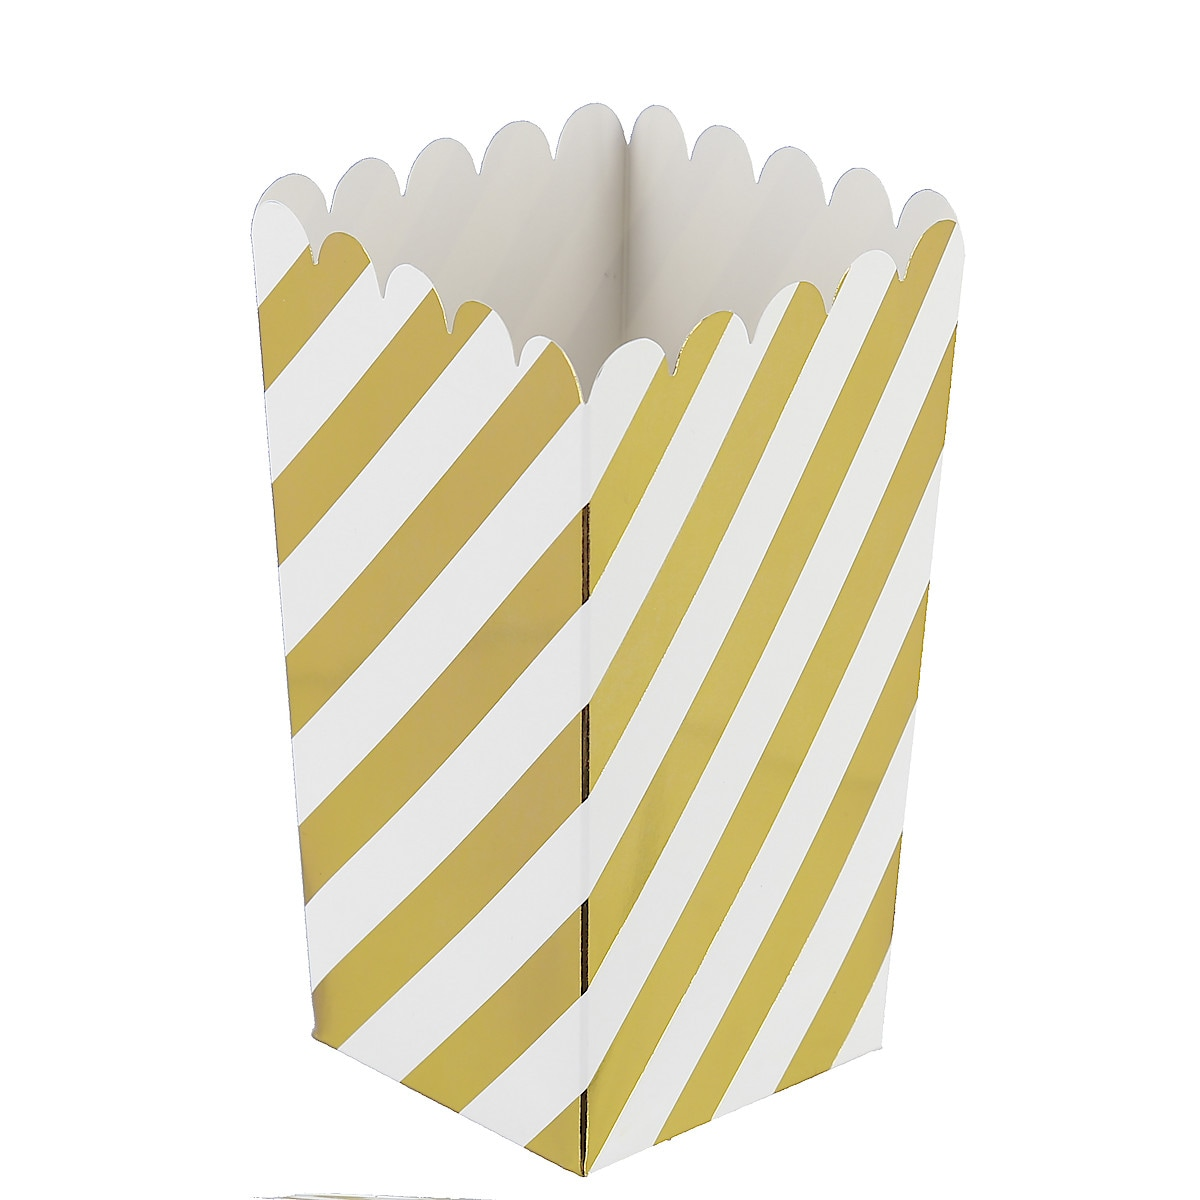 Popcorn-kulho, kulta